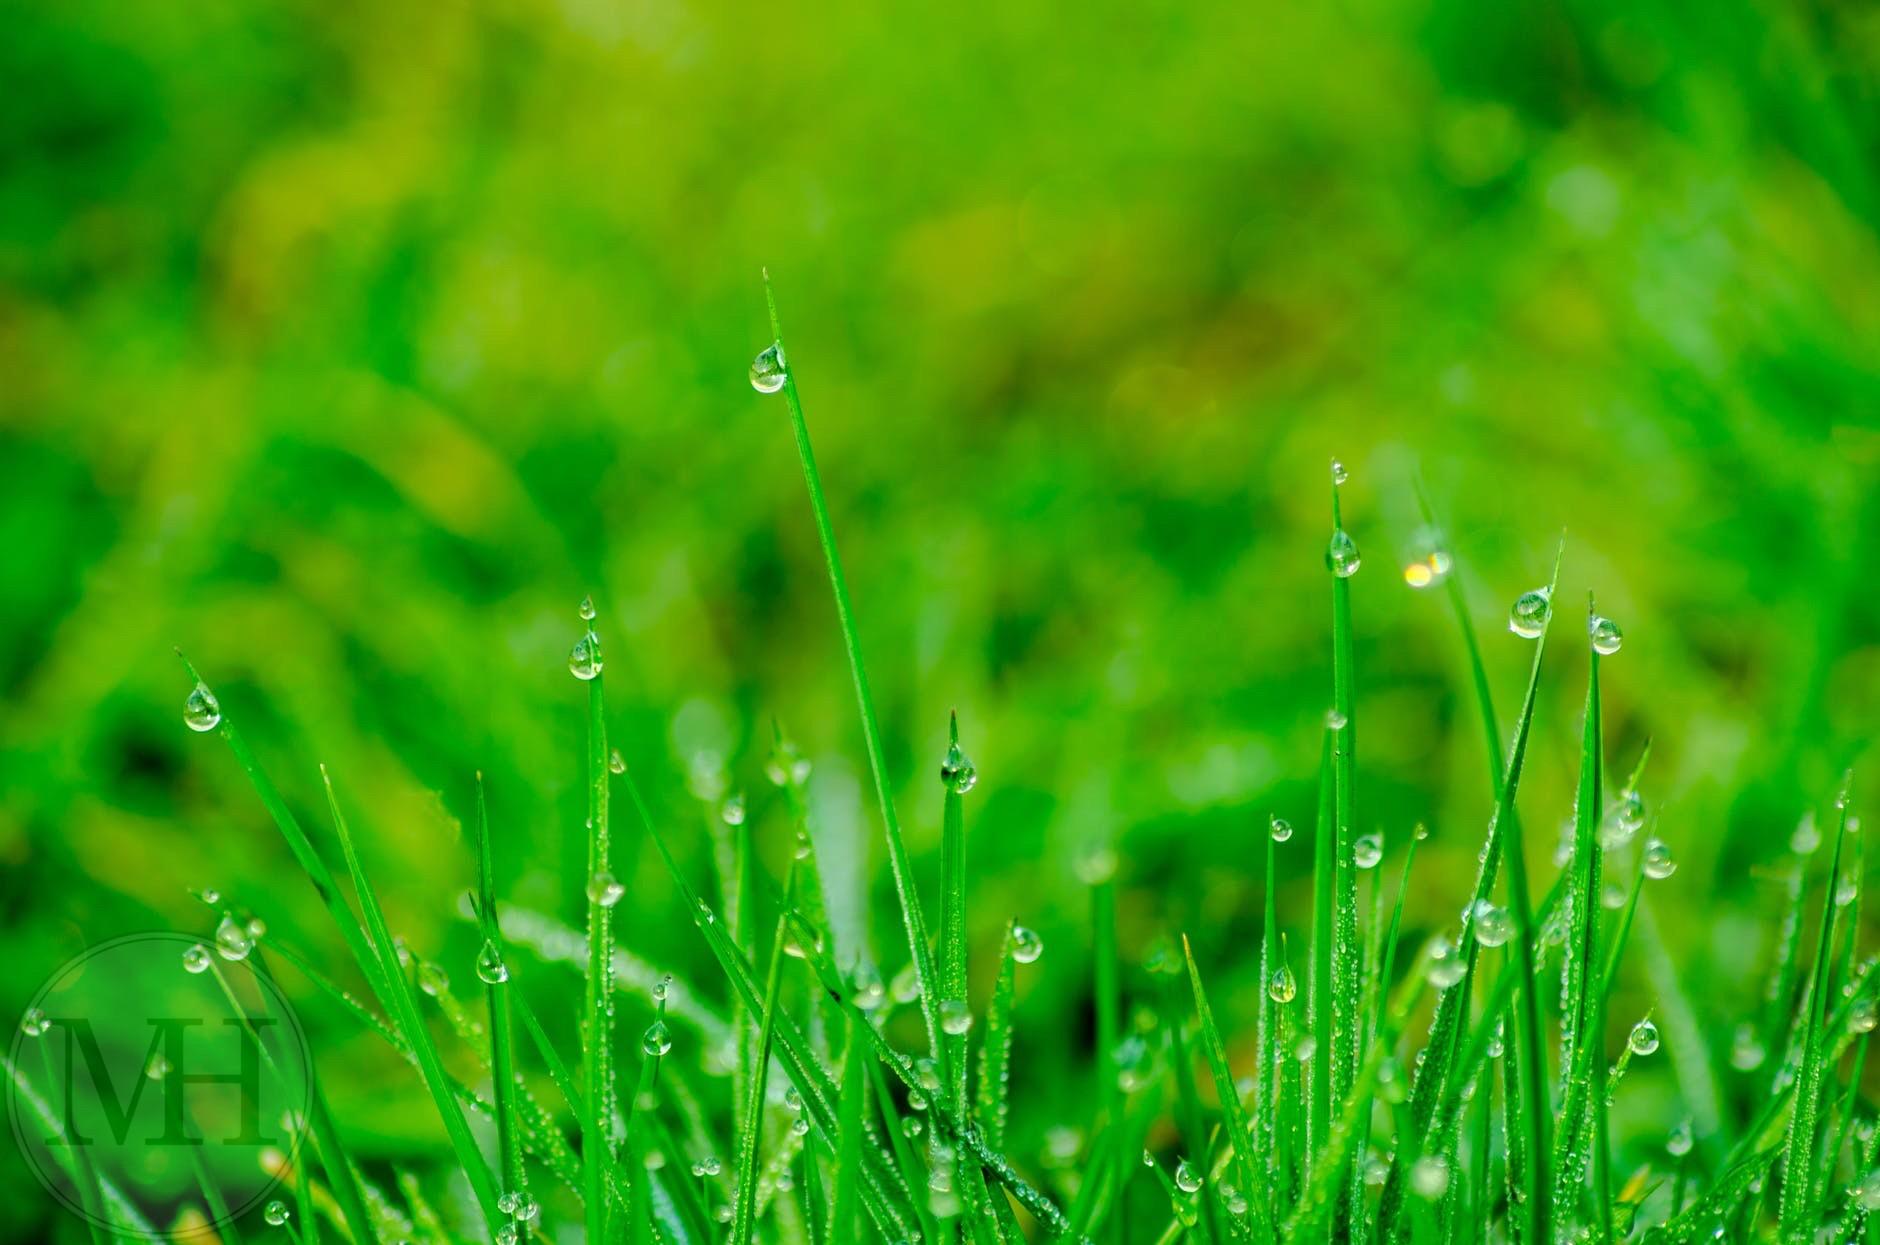 regn græs